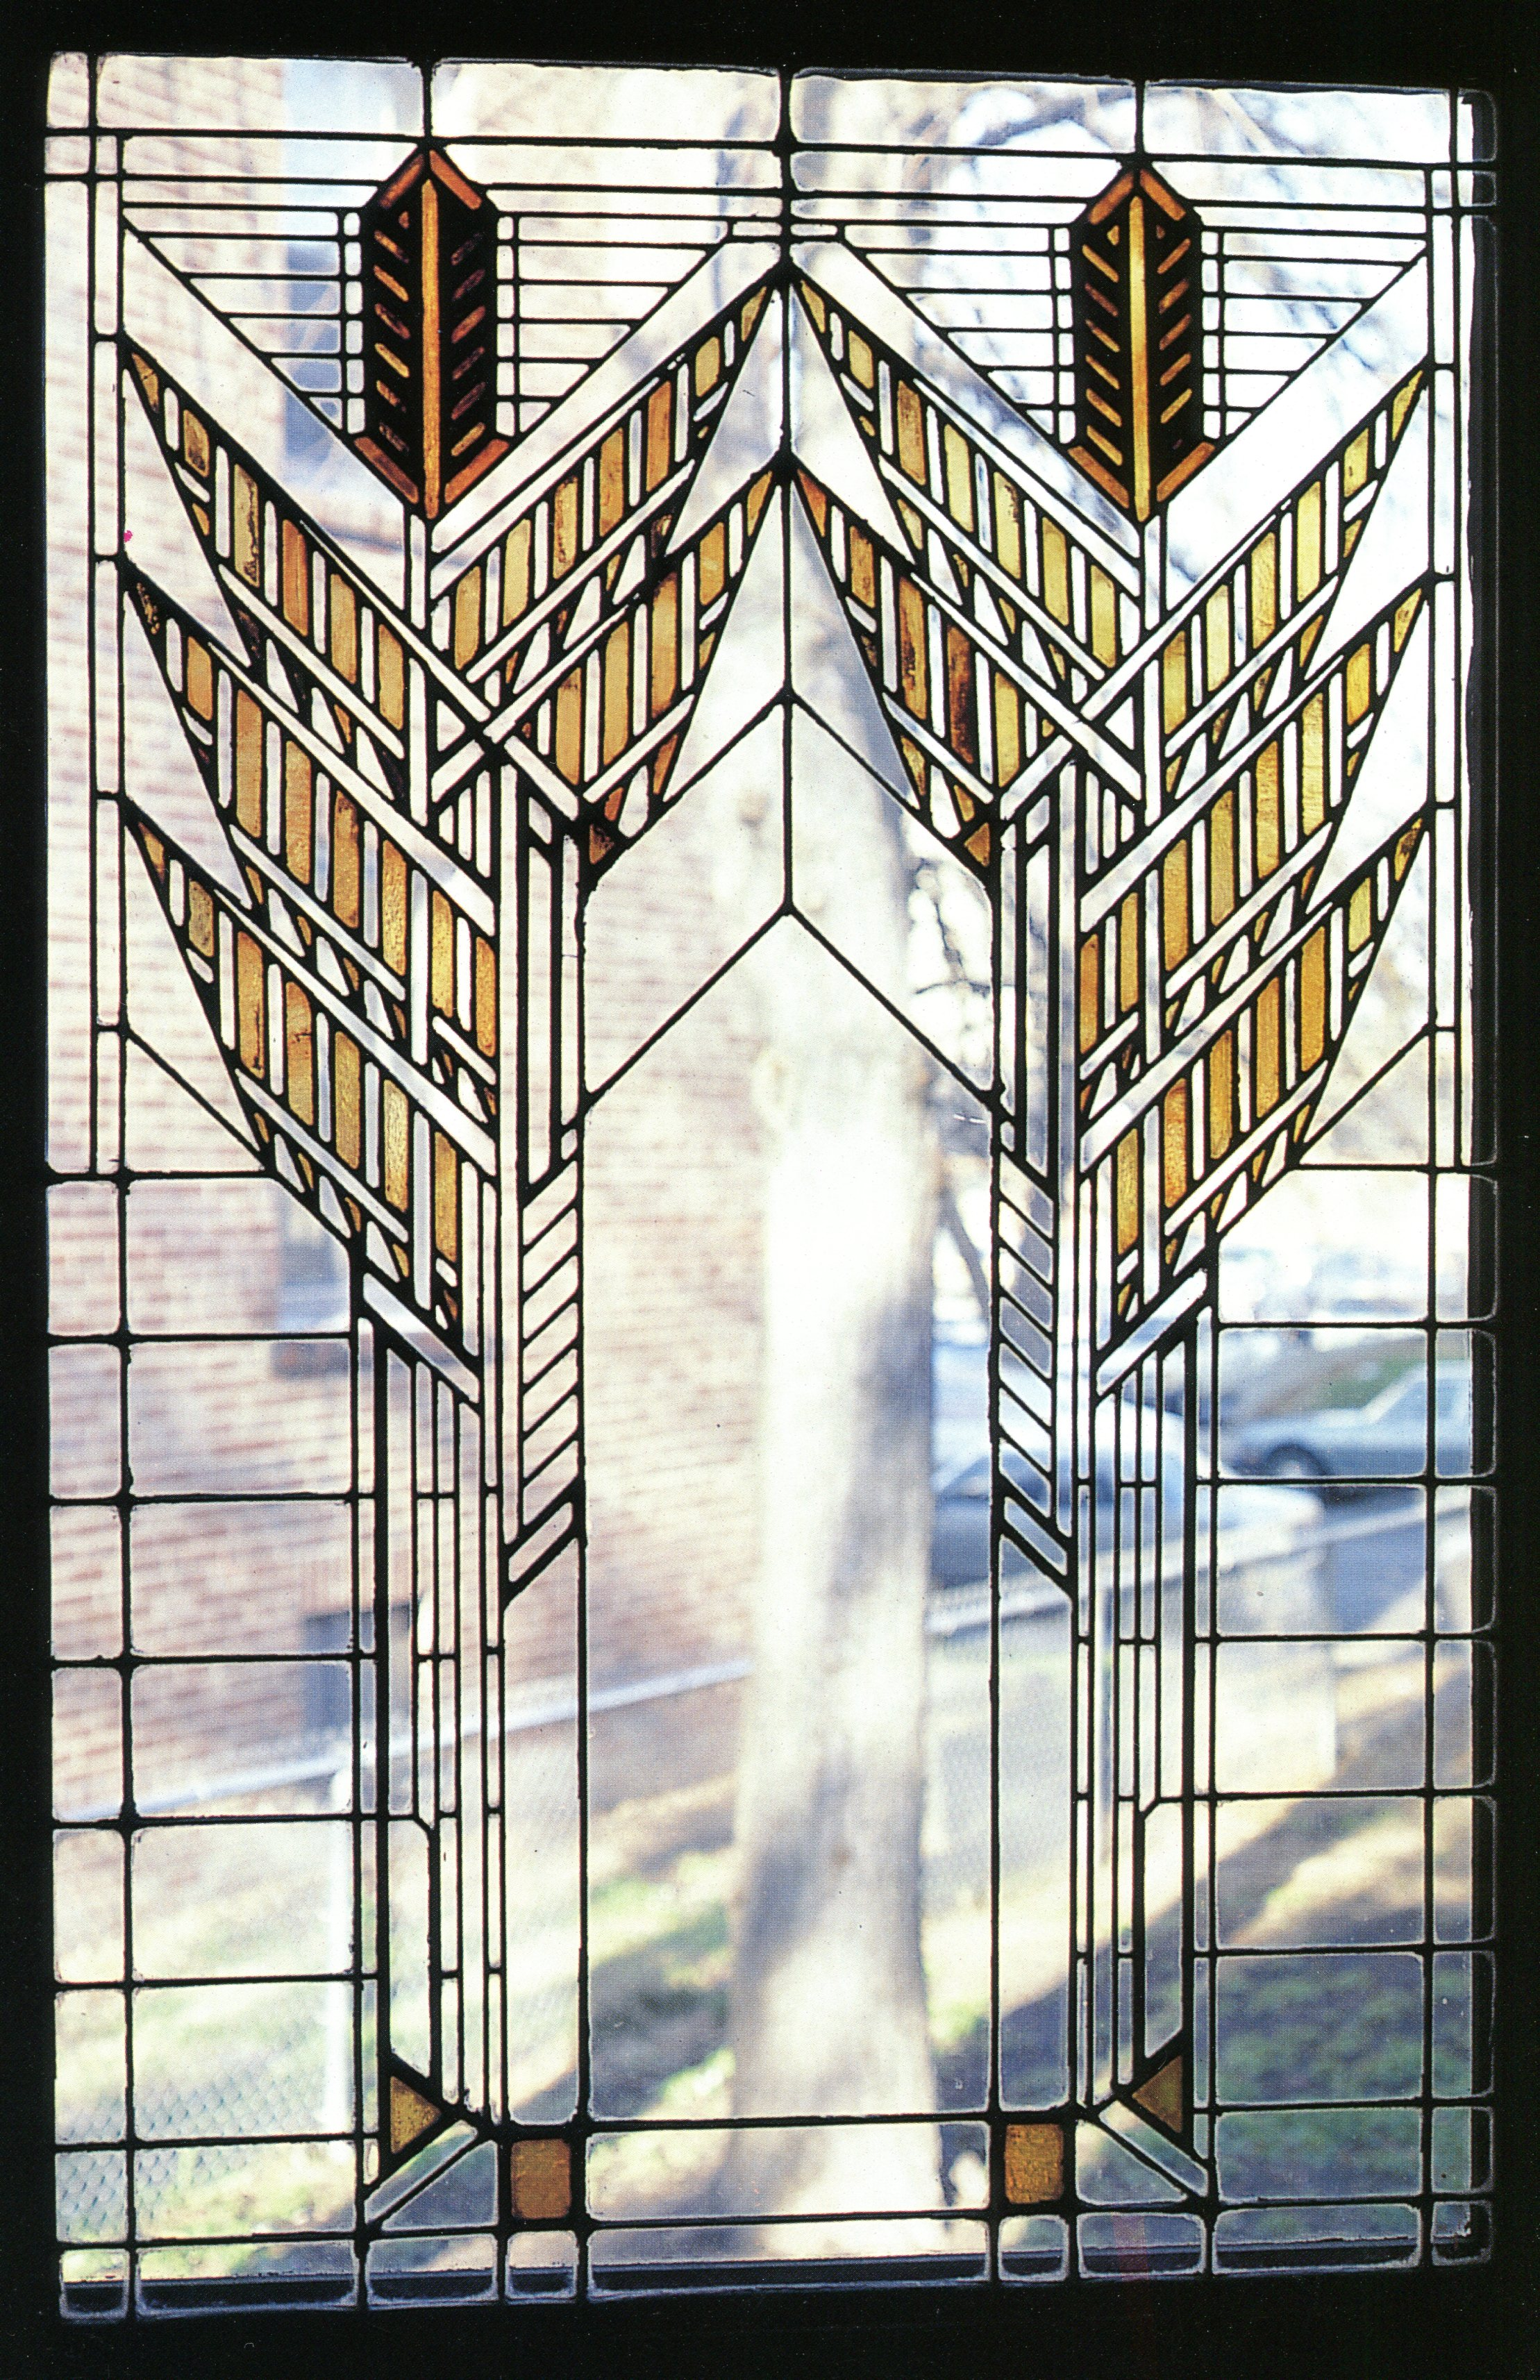 Wright's Dana House (1899) dining room windows